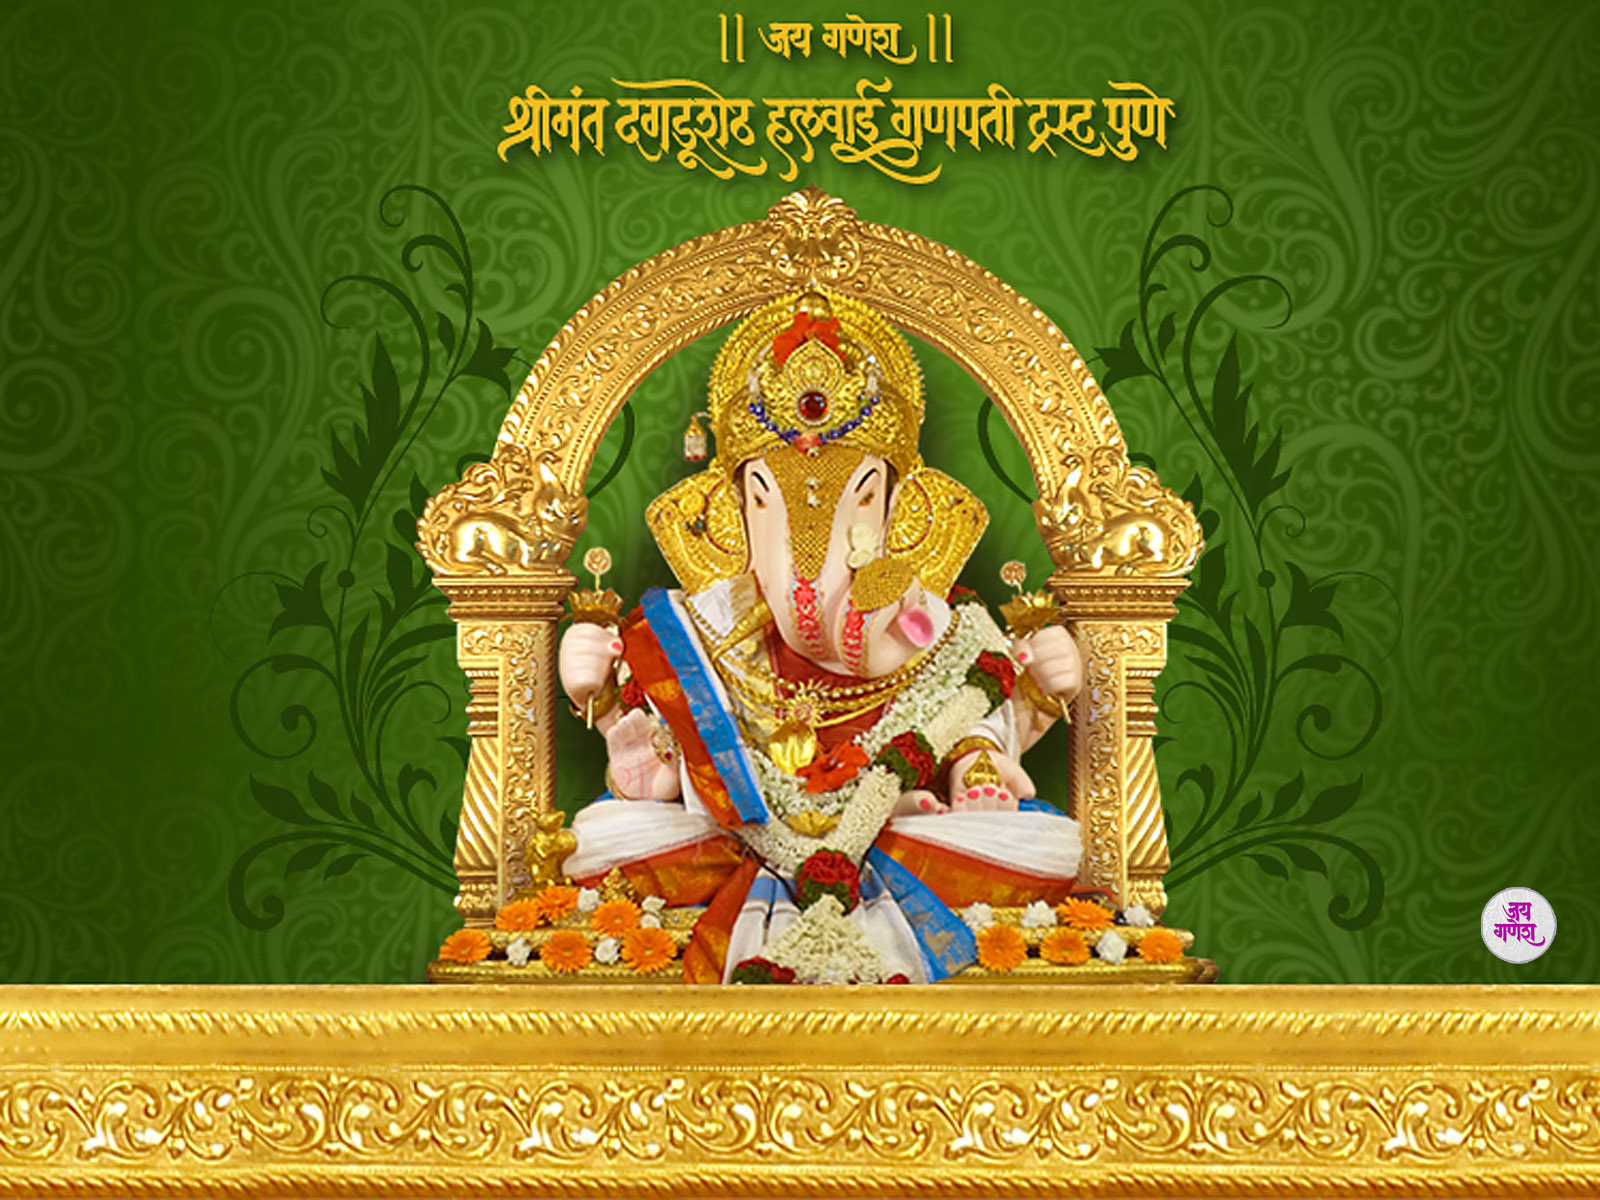 Dagdusheth-Ganpati-Images-wallpaper-wp4001464